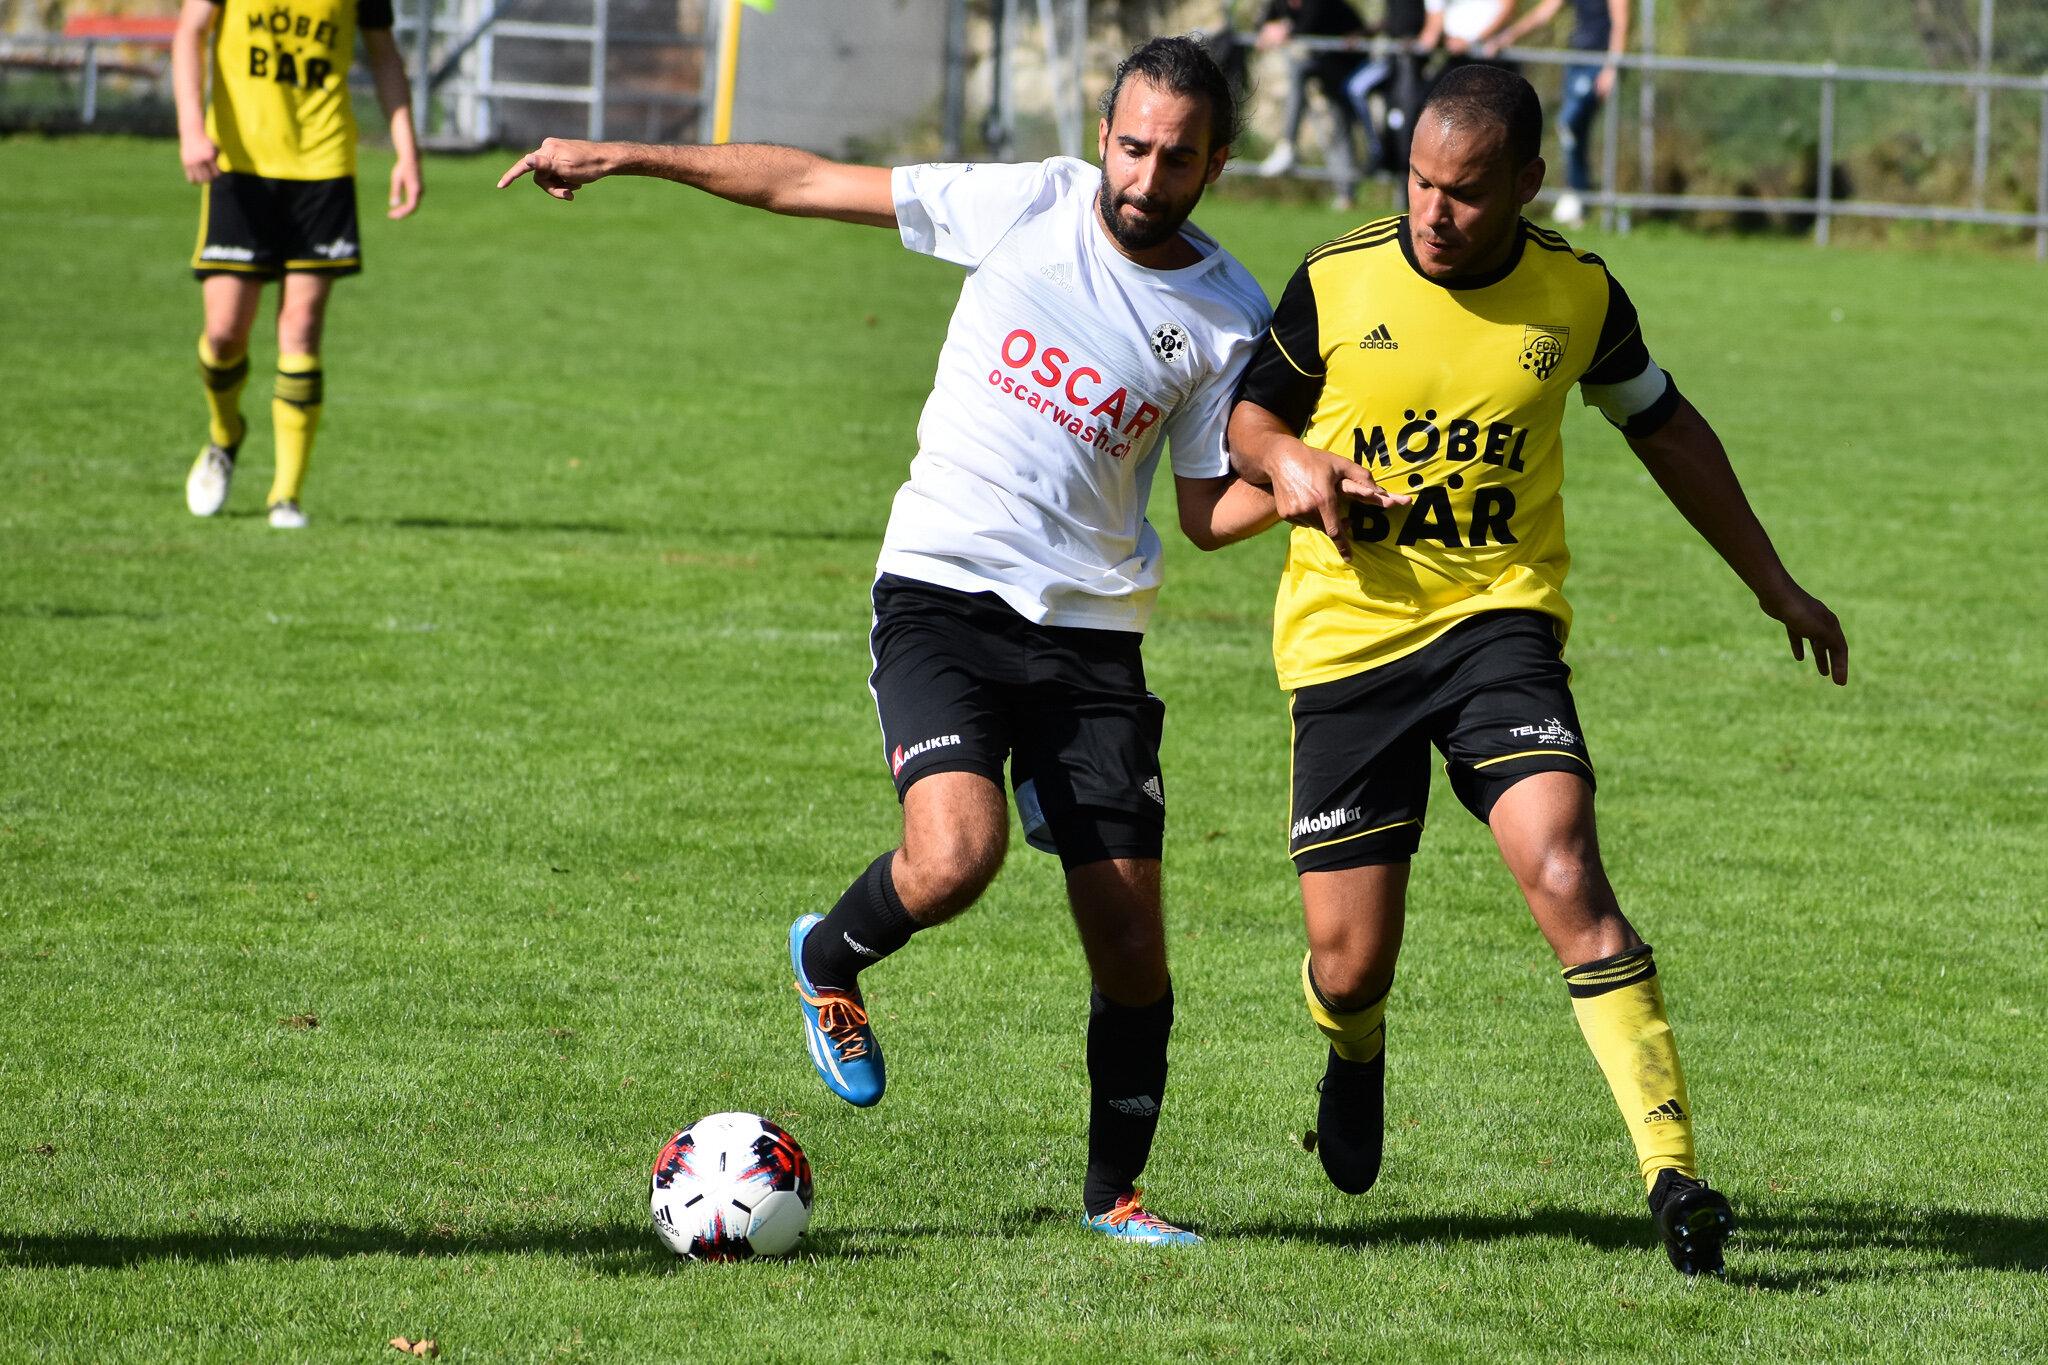 Torschütze Andrej Barbarez setzt sich gegen Altdorfs Captain Calderon durch. Foto: FC Altdorf